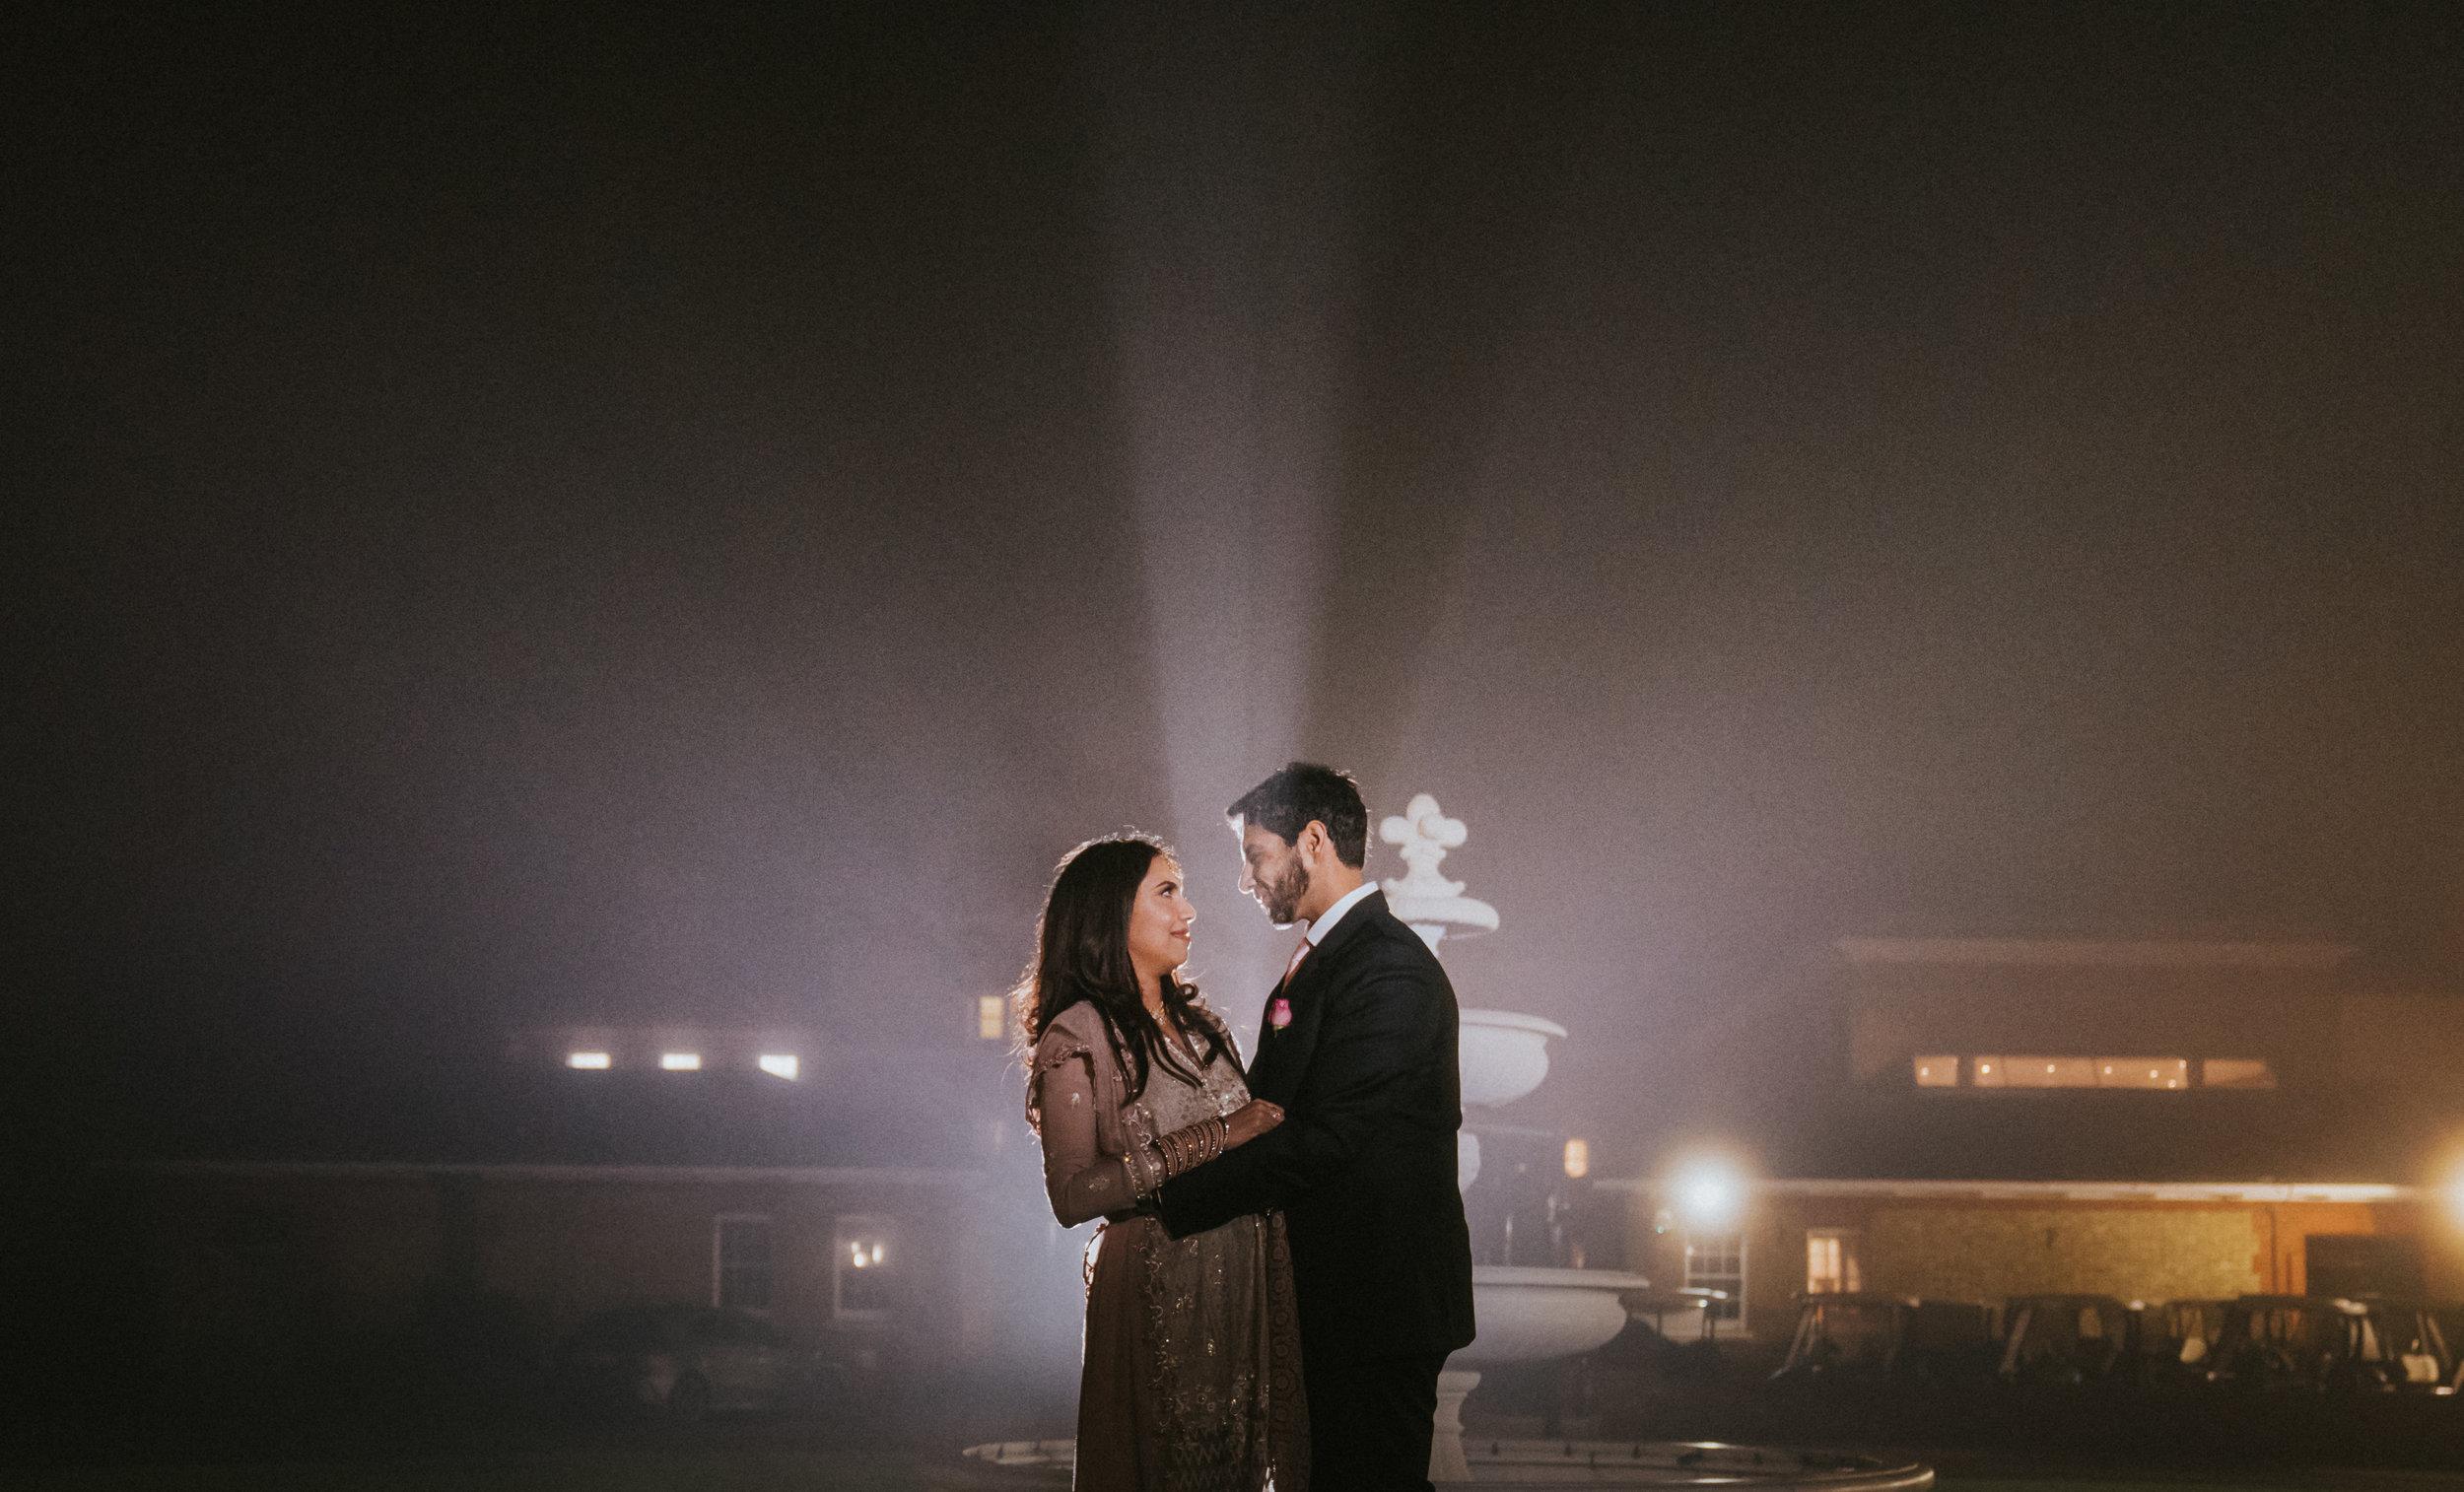 buckinghamshire-golf-club-winter-muslim-wedding-engagement-photography-videography-74